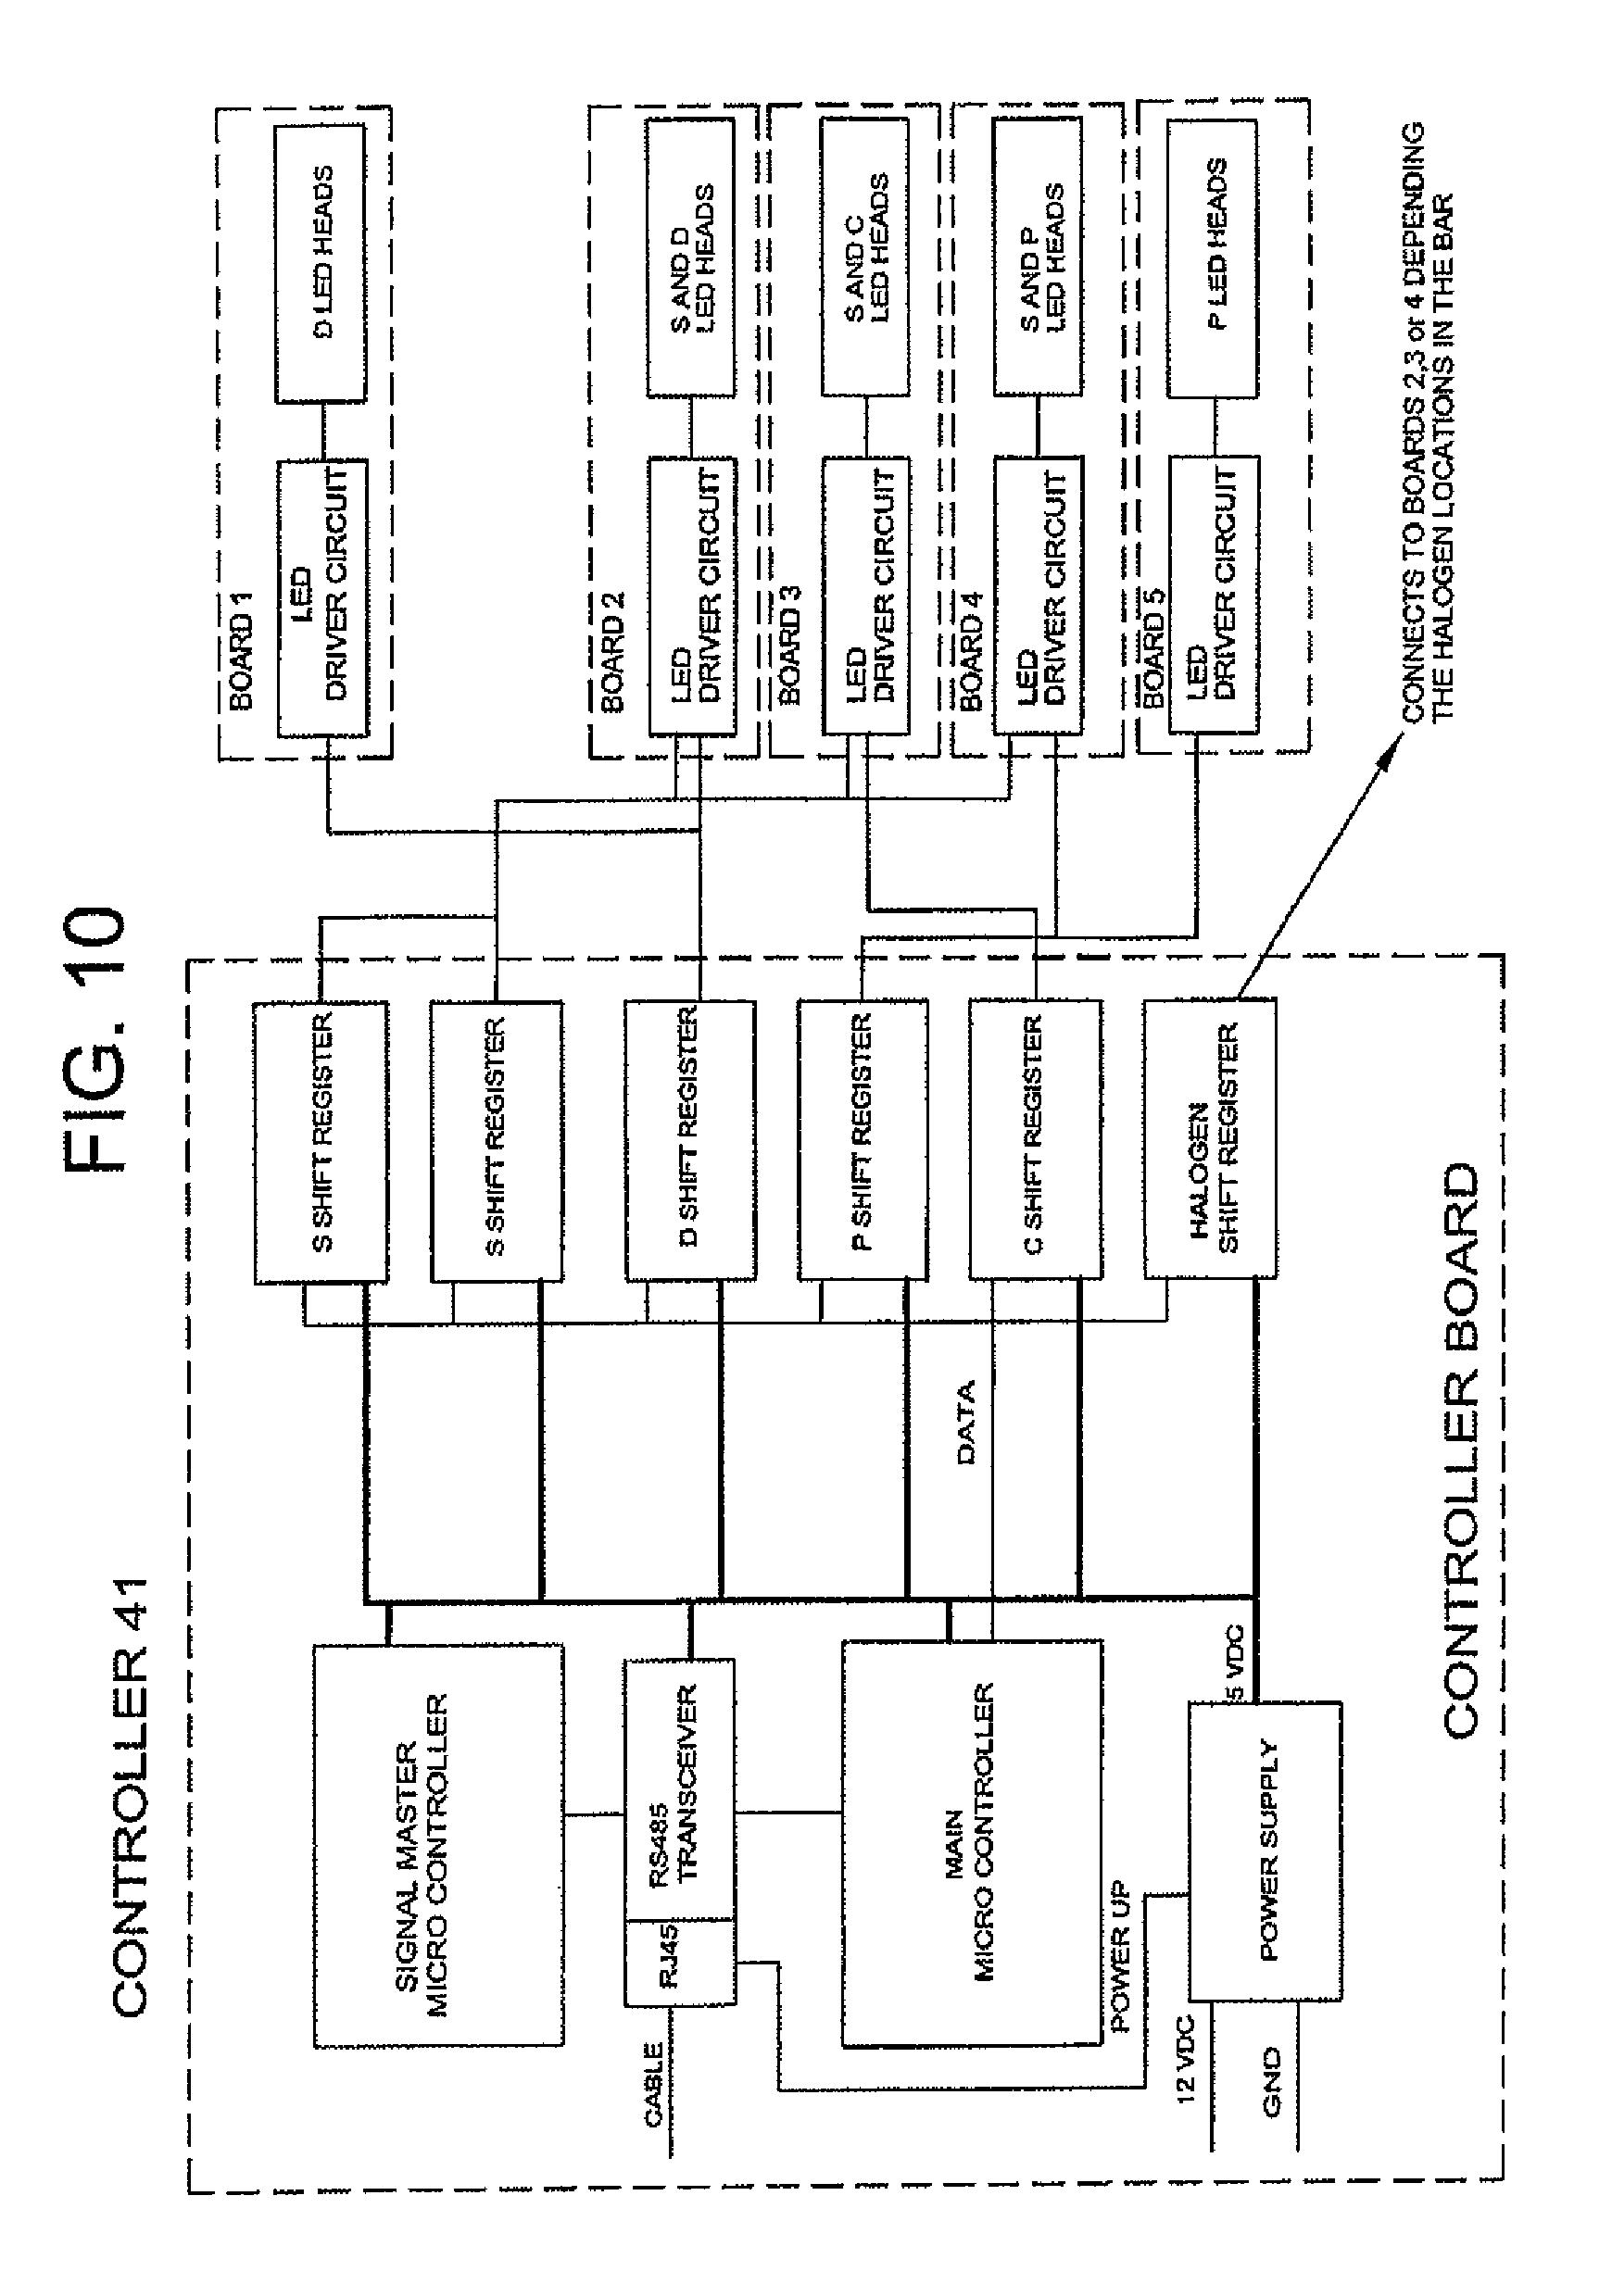 federal signal rumbler wiring diagram